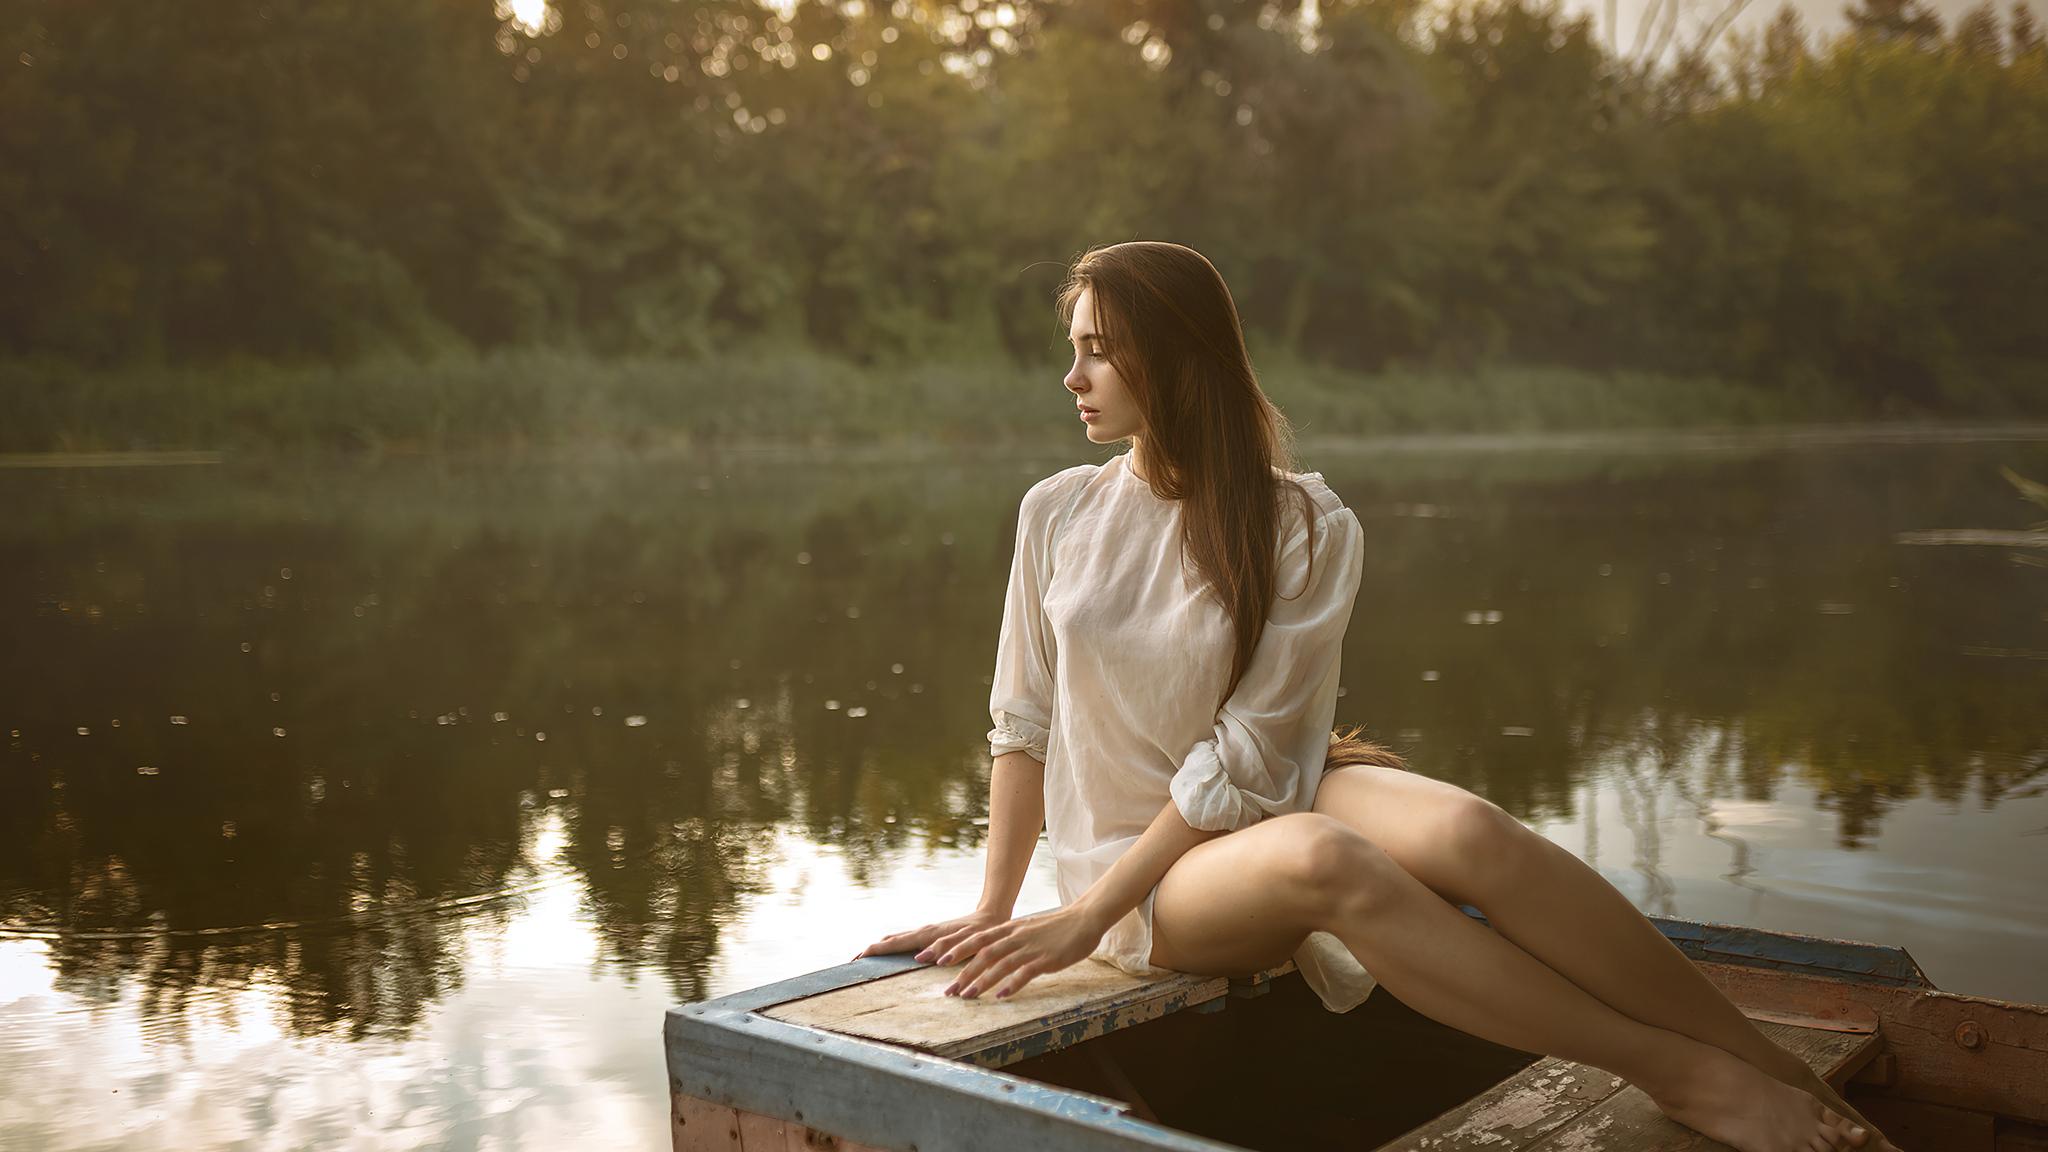 girl-boat-evening-photography-4k-hn.jpg